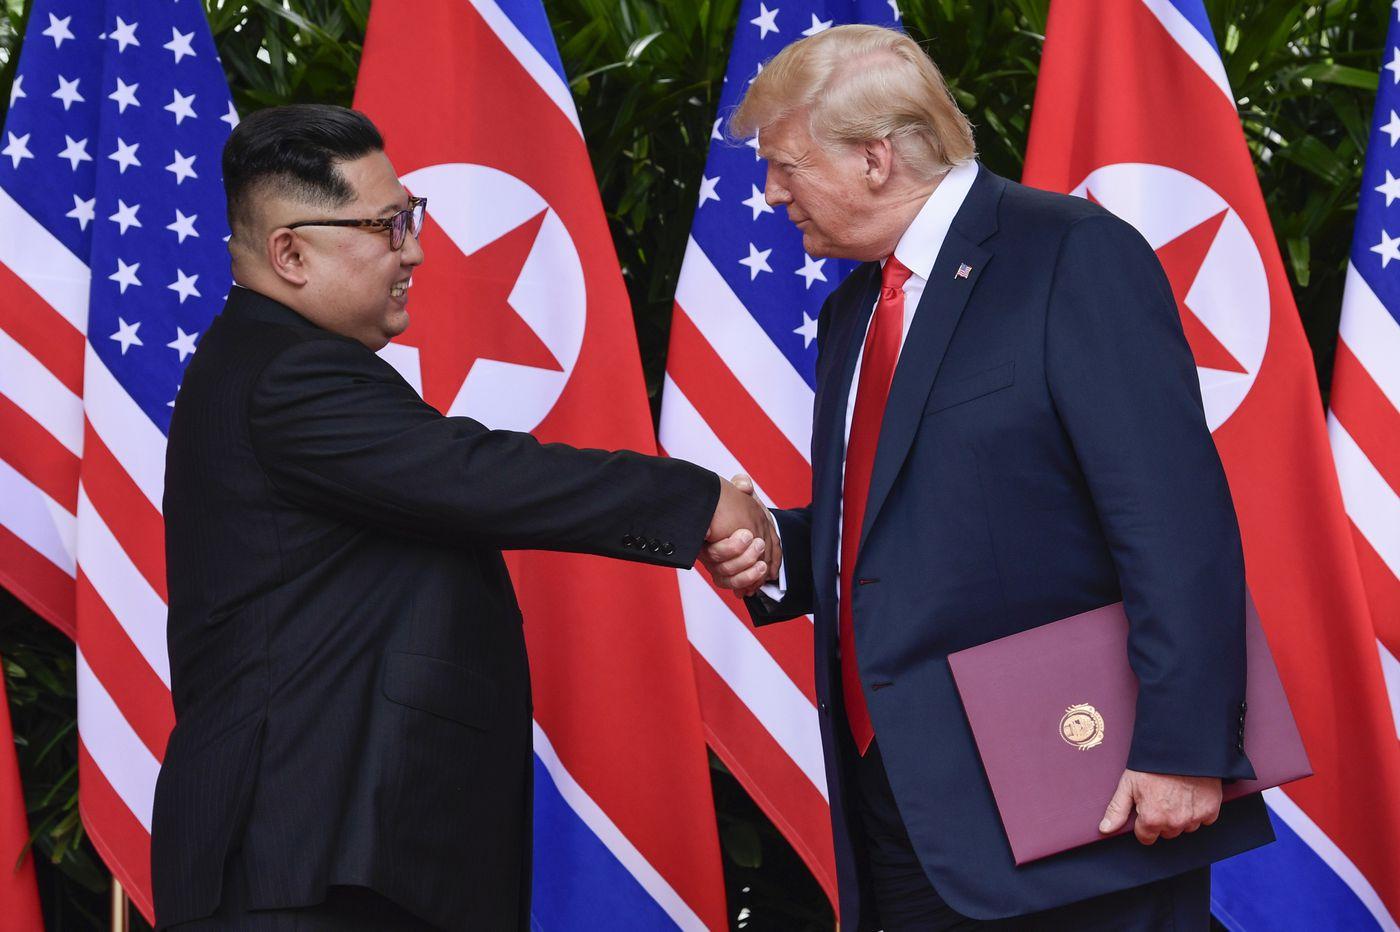 4 reasons why declaring peace on the Korean peninsula is a bad idea | Trudy Rubin